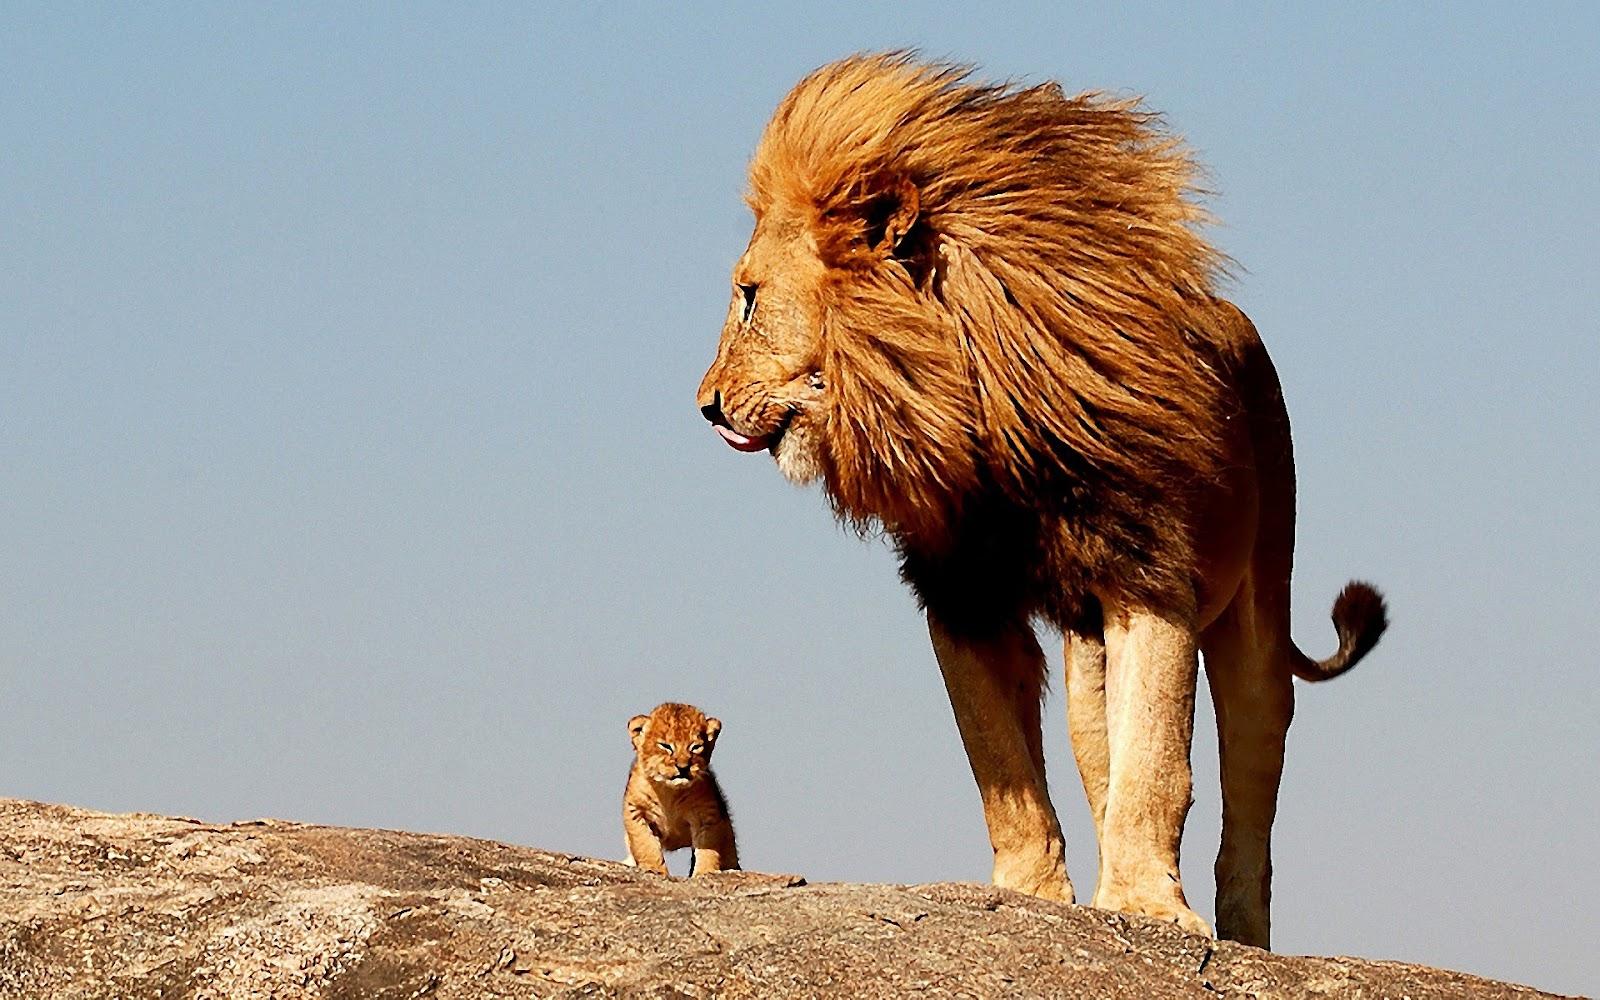 Lion Hd Wallpapers Lion Hd Wallpapers Album On Imgur Lion Hd